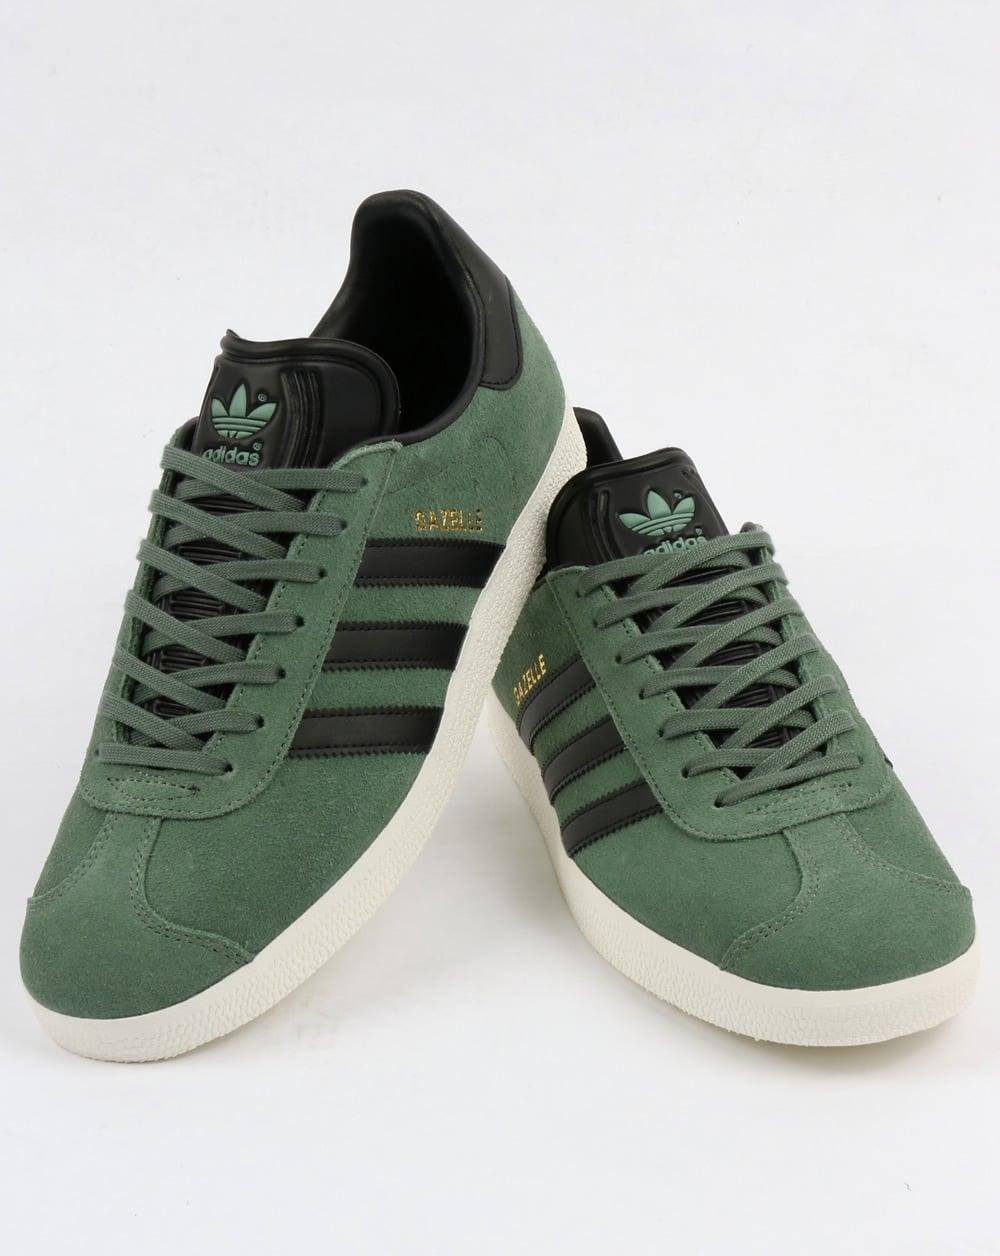 Adidas Originals Gazelle Indoor Shoes Dark Green Black